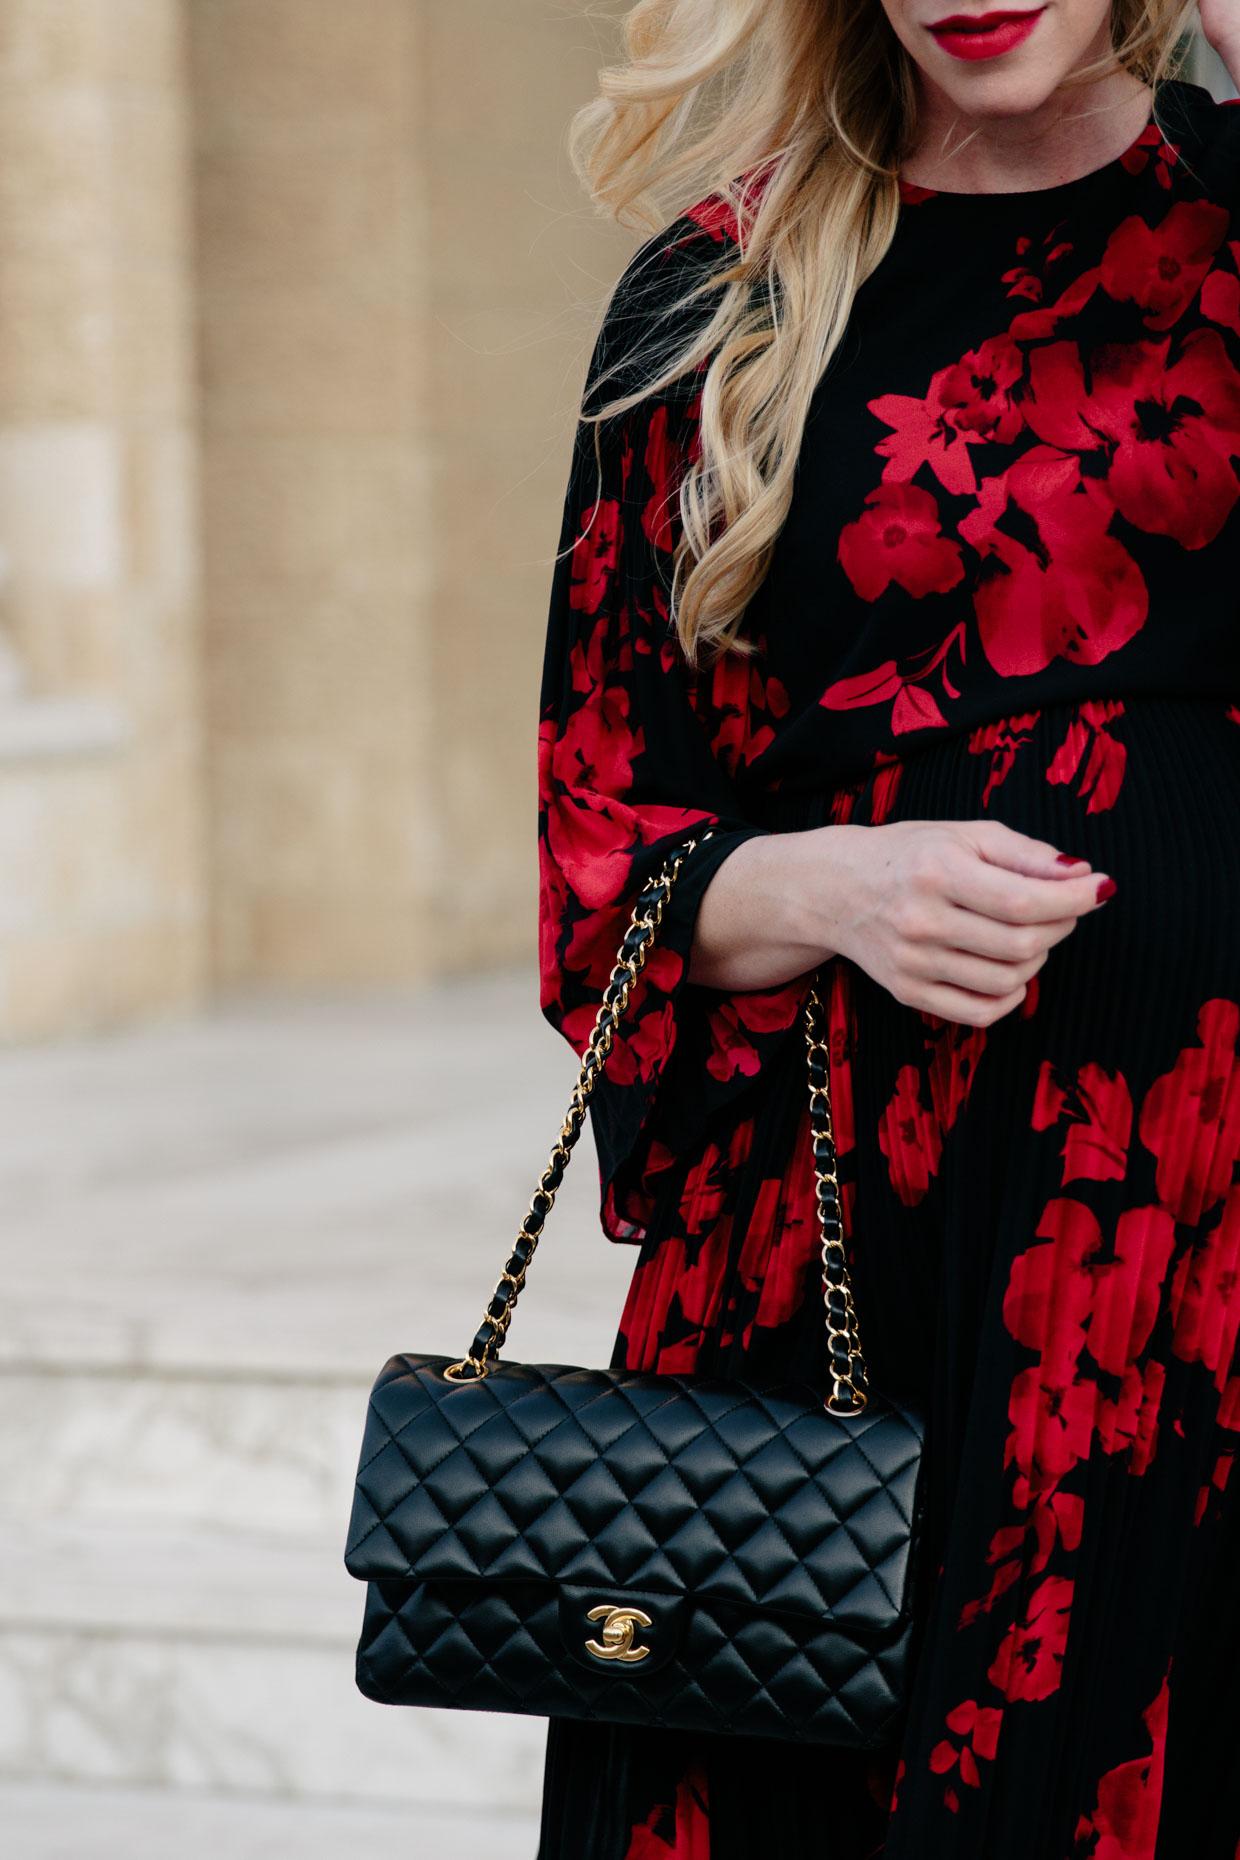 Dark Romance Floral Midi Dress With Sock Boots